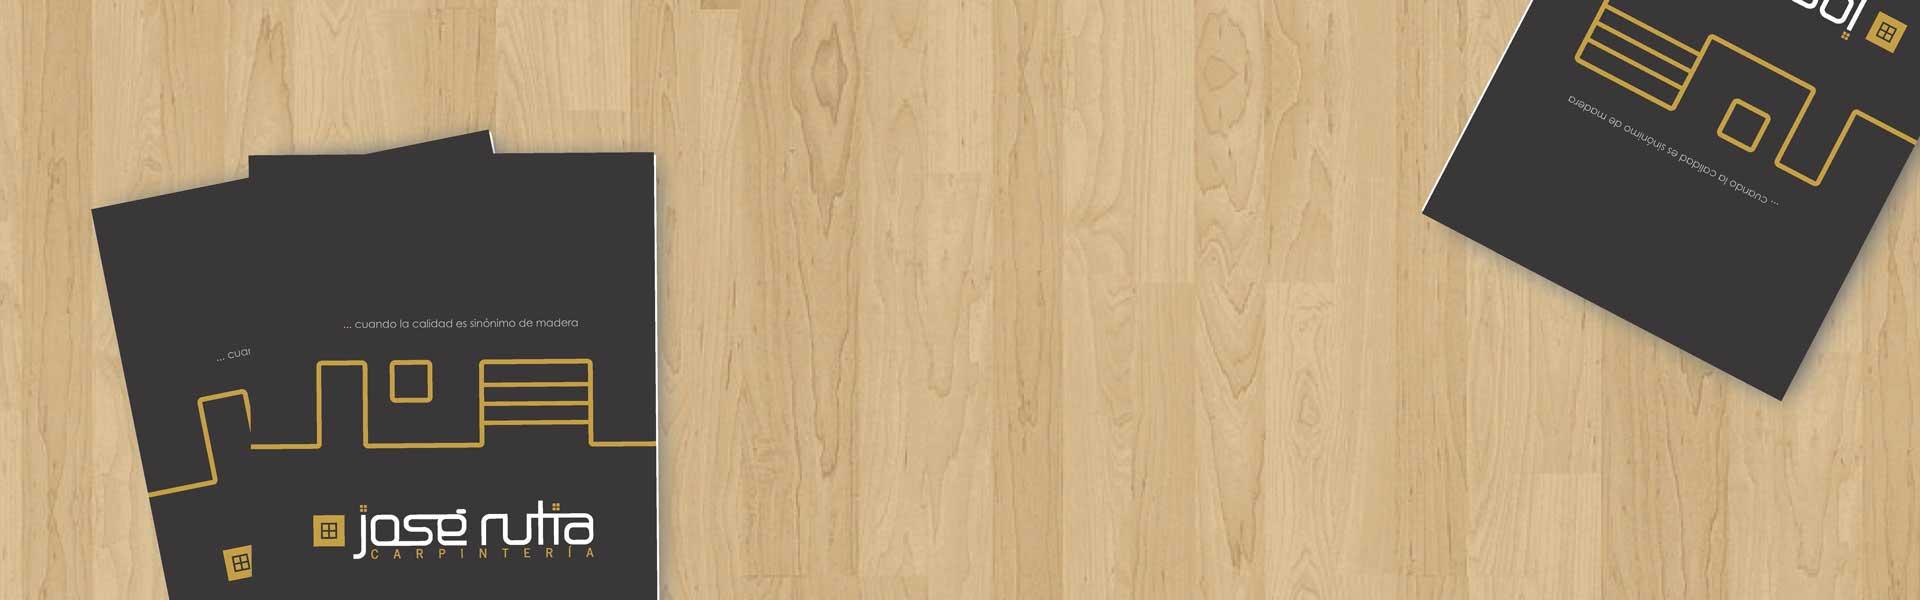 carpinteria-fondo-folleto